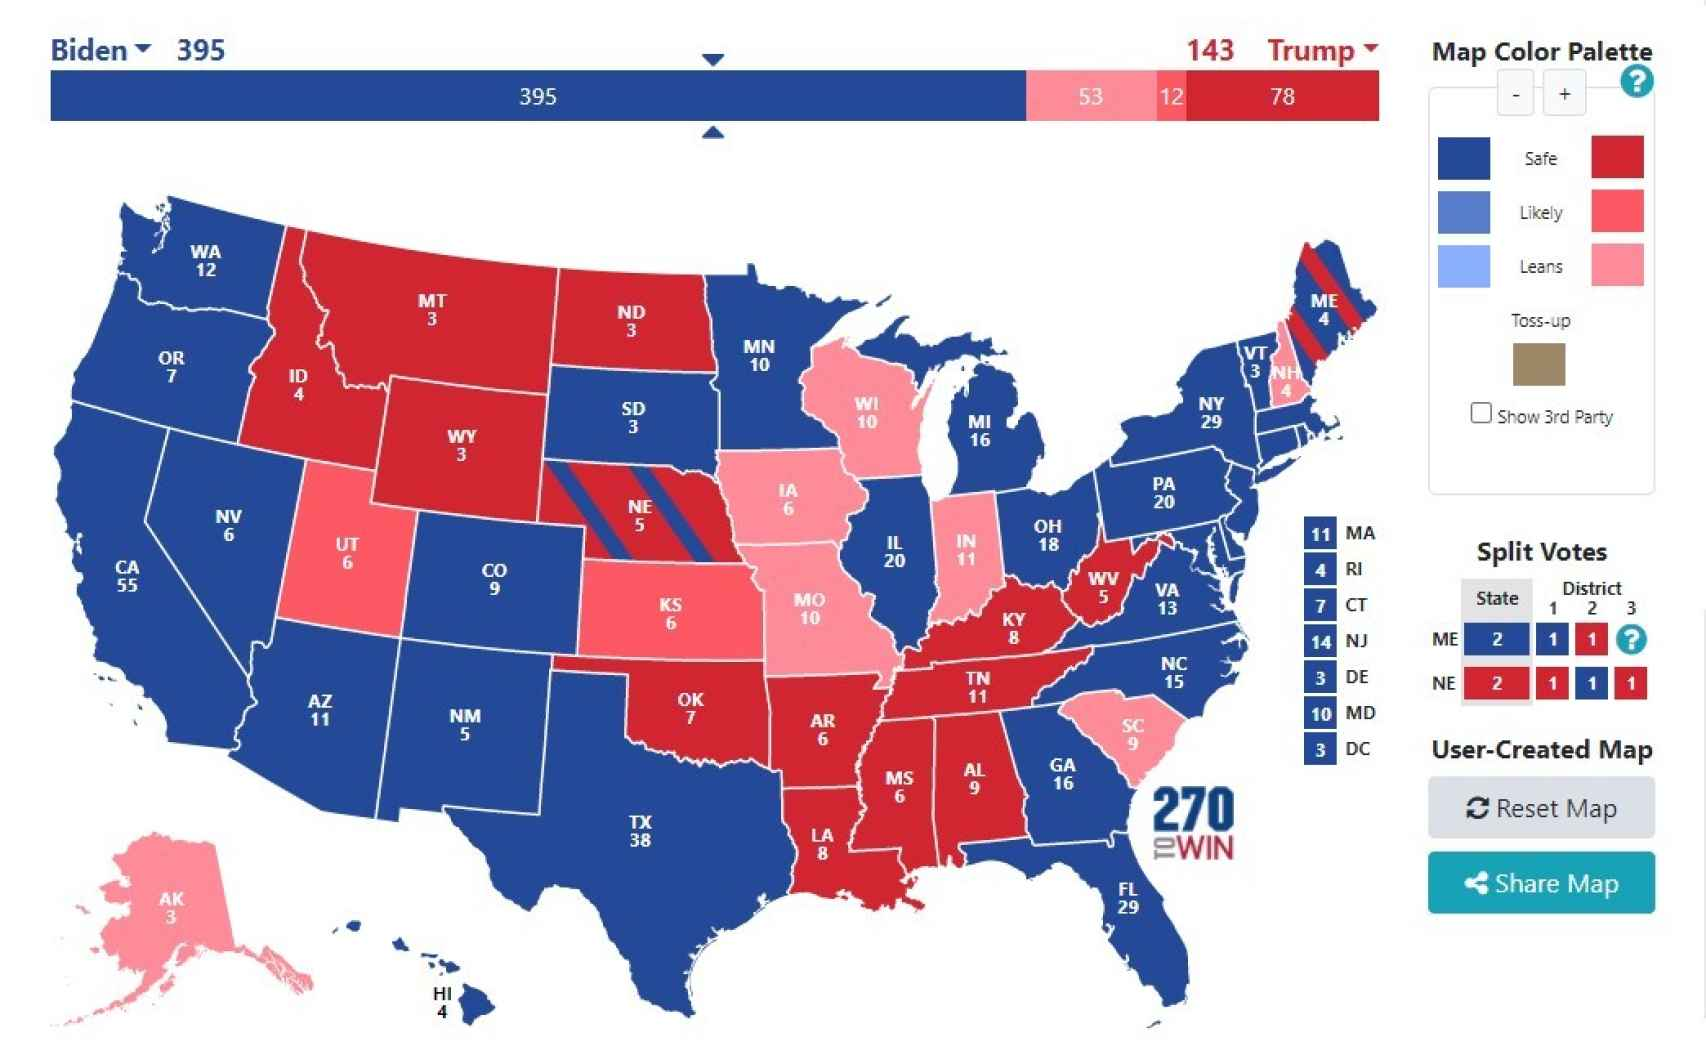 Posible resultado electoral si a Trump se le da muy mal la noche.